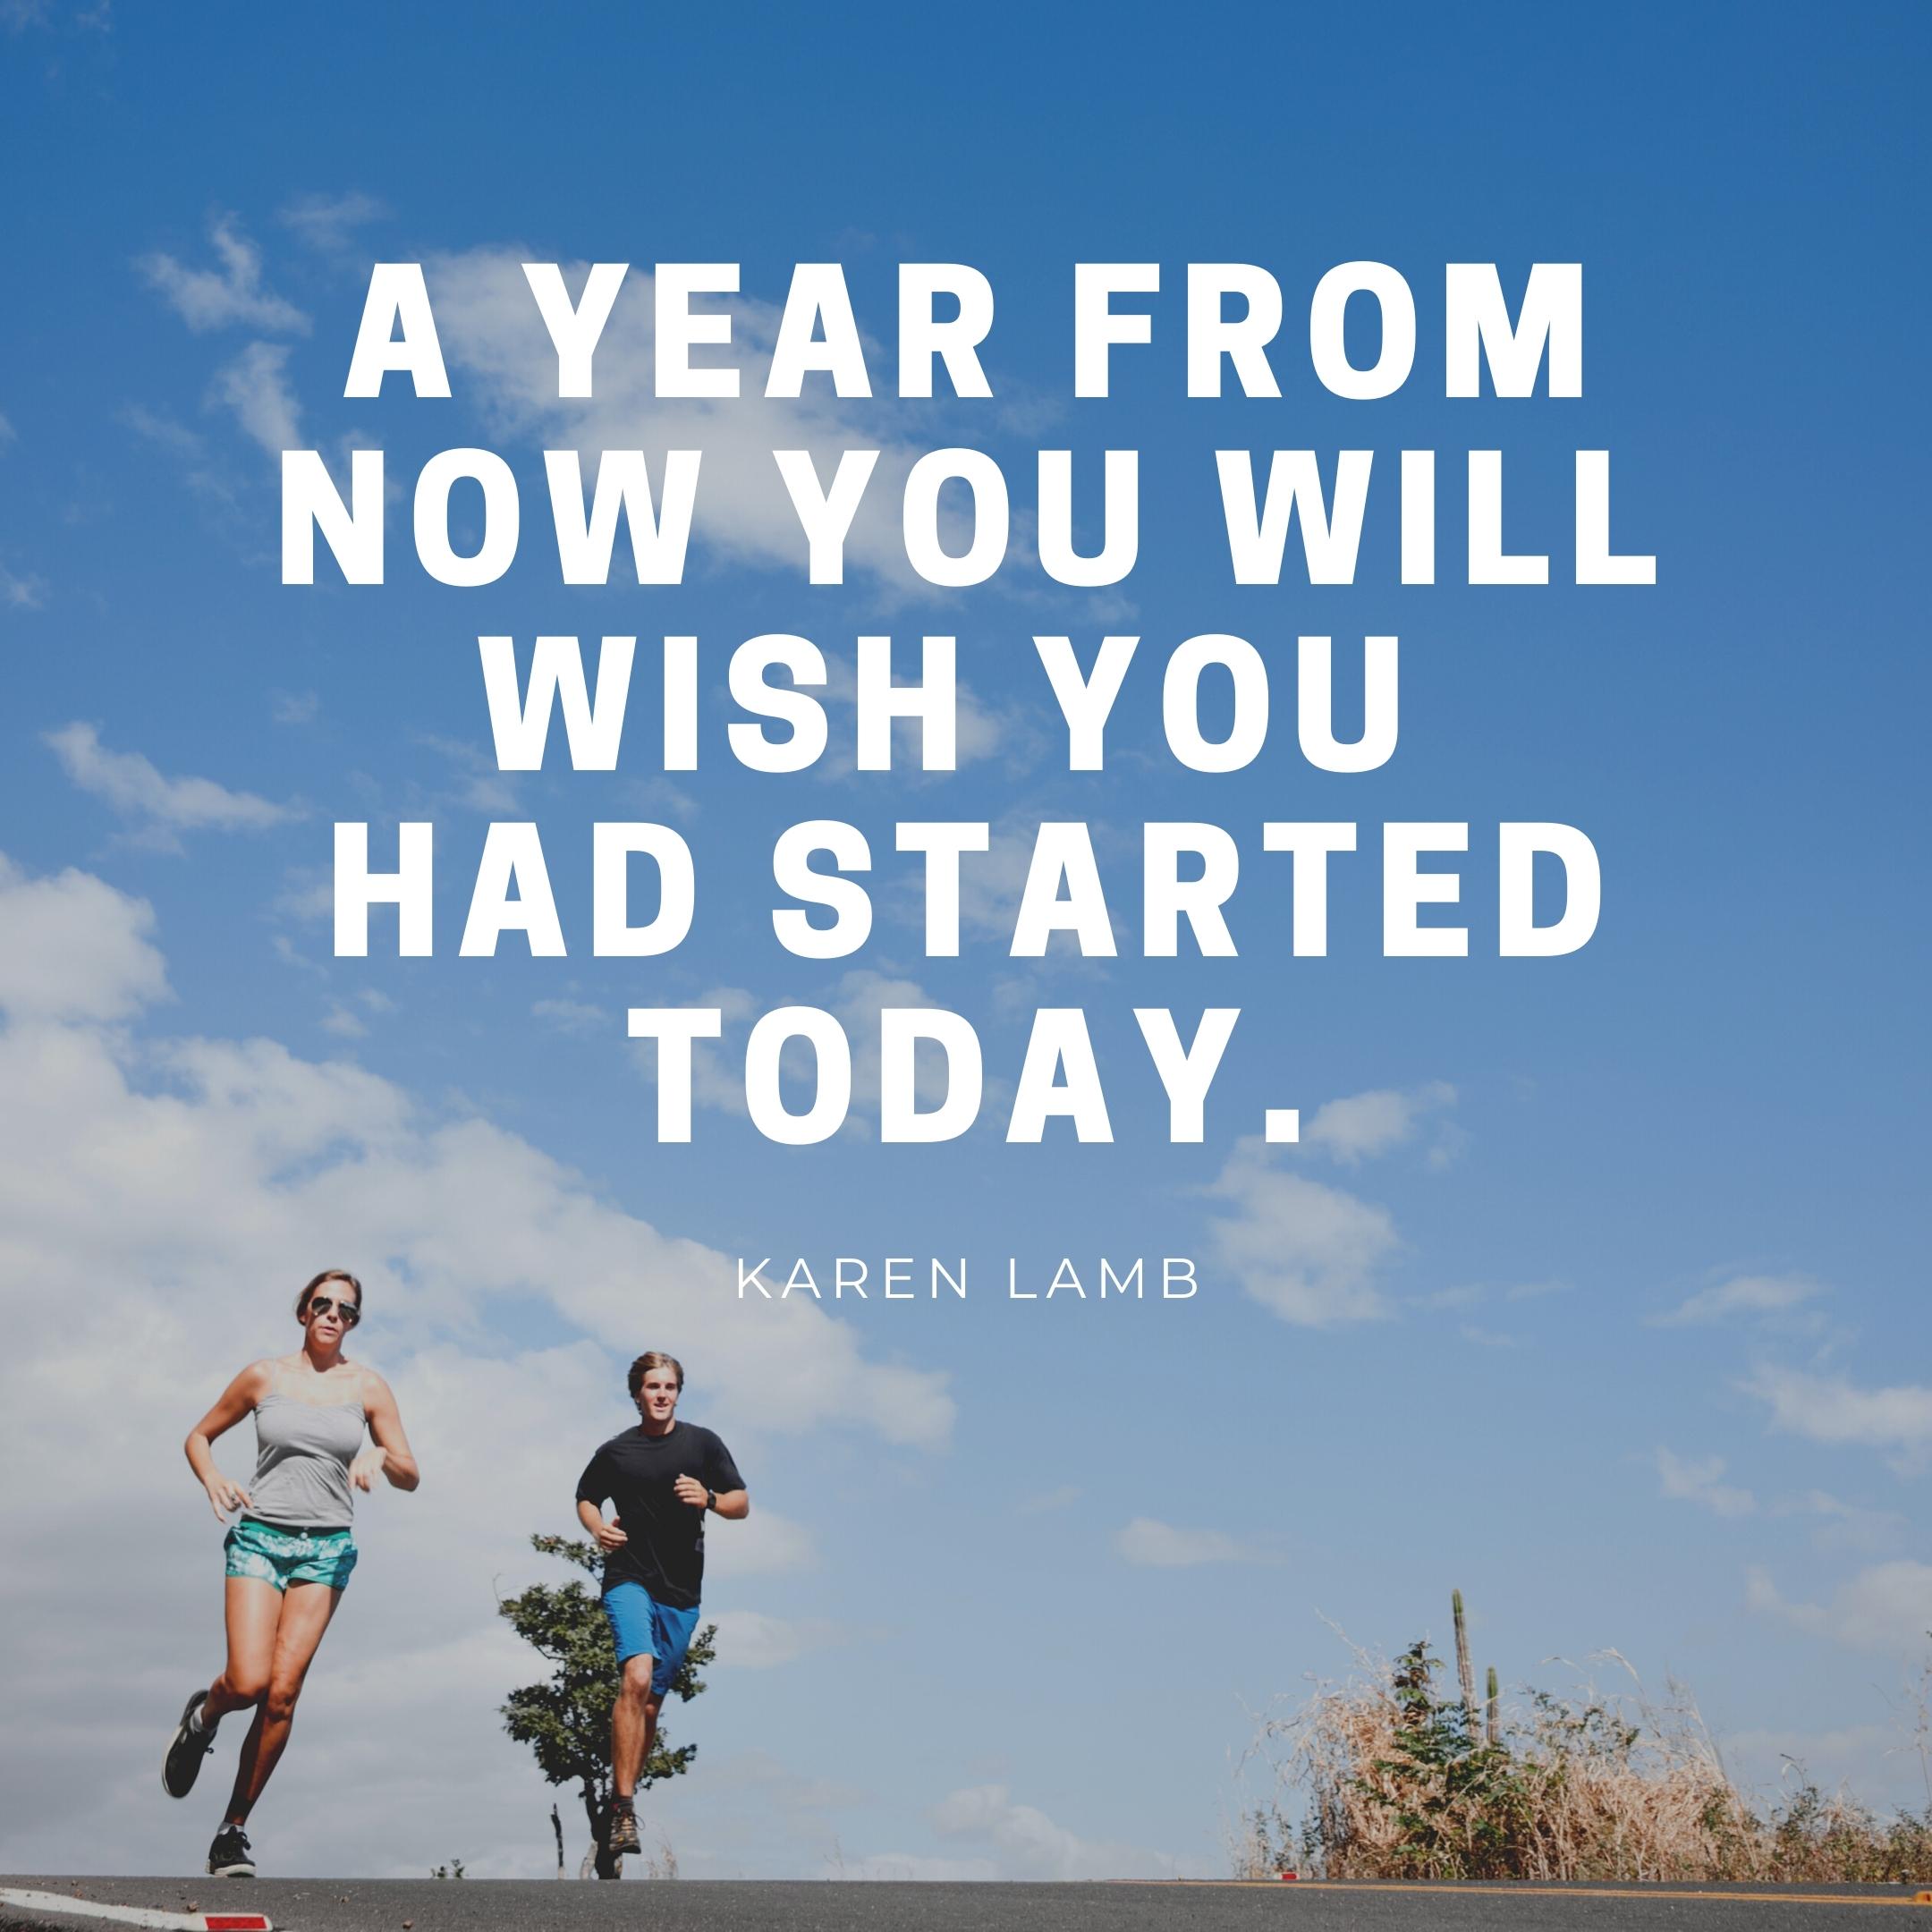 karen lamb quote | daily motivation